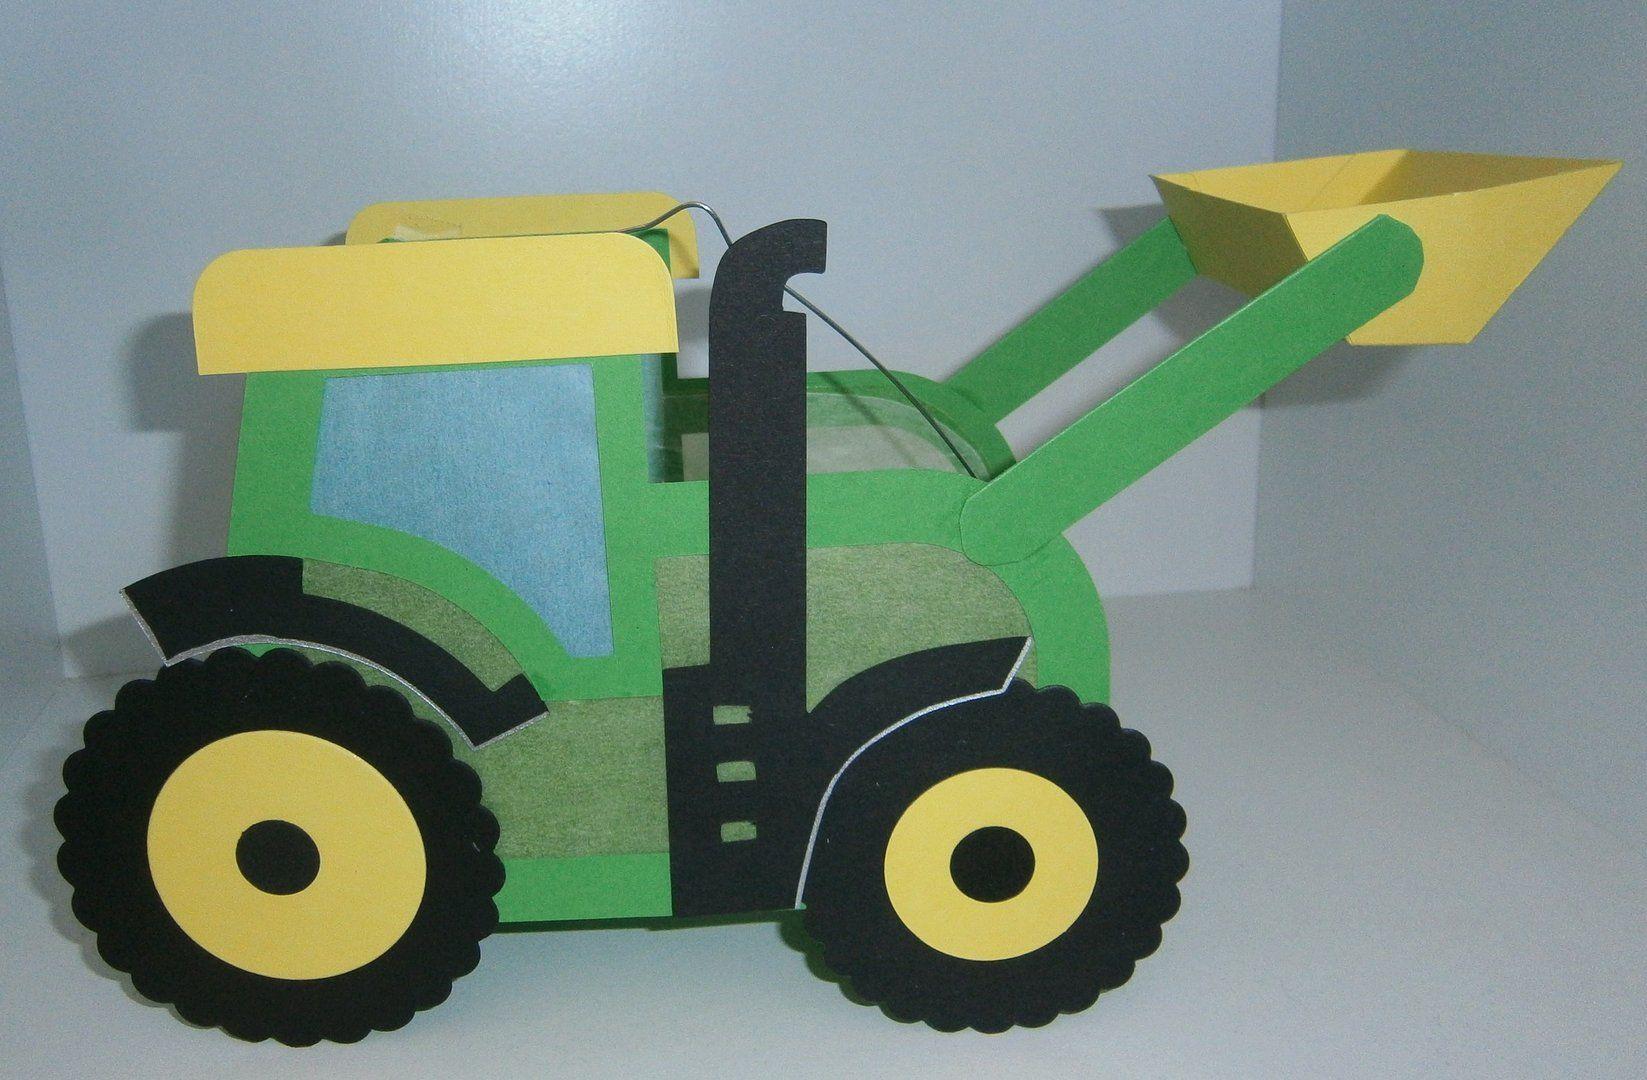 Laterne Traktor John Mit Schaufel Laterne Basteln Vorlagen Kinder Basteln Laternen Laternen Basteln